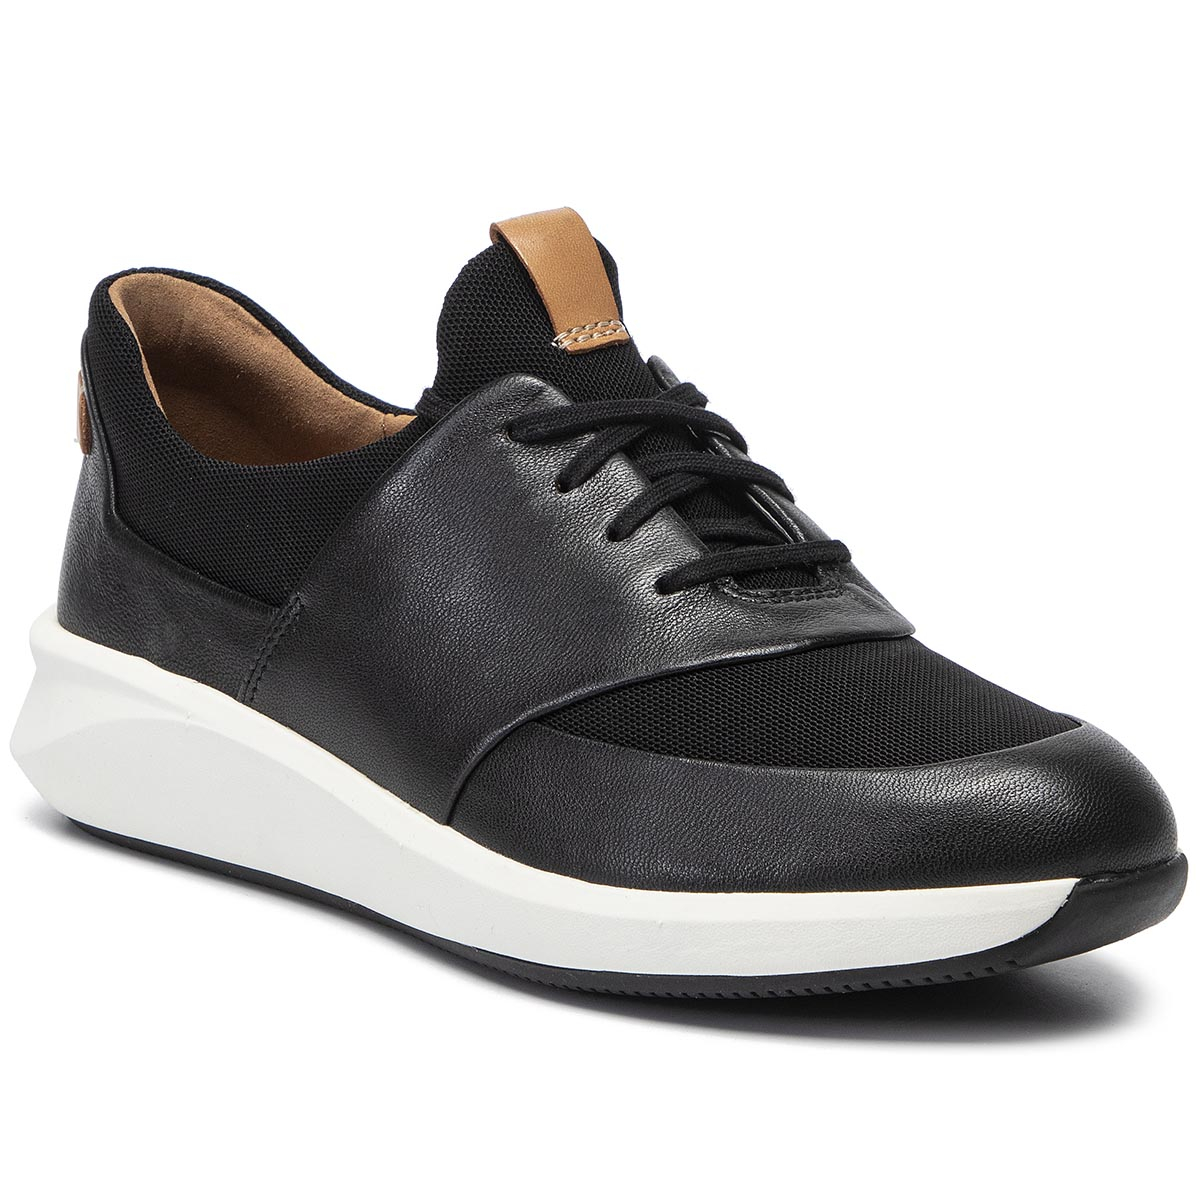 Sportcipő GEOX - D Ophira A D021CA 05402 C9999 Black - Sneakers - Félcipő - Női